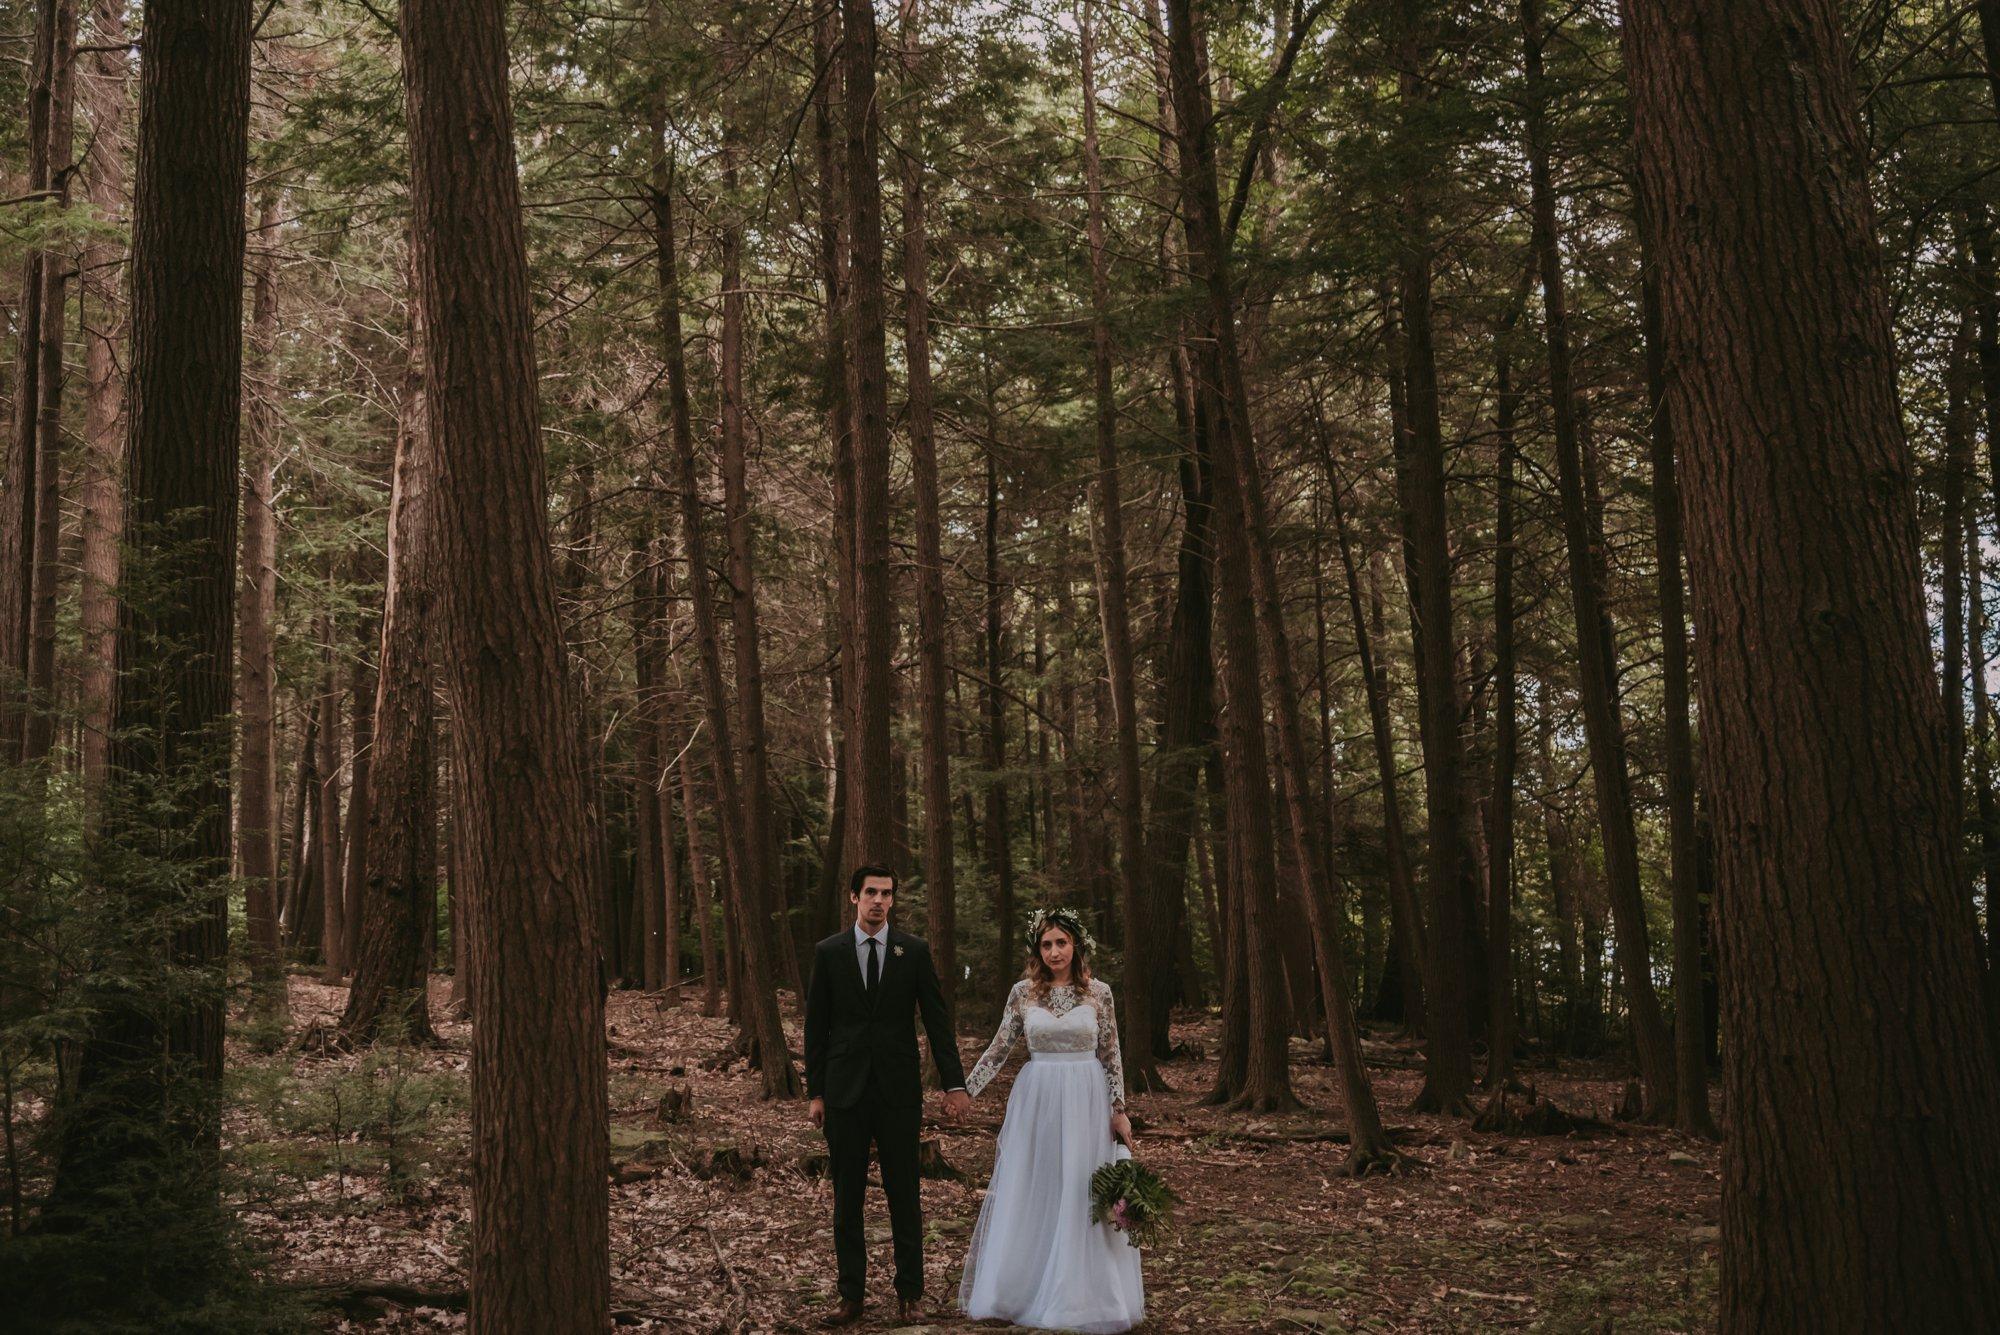 Rustic Intimate Vegan Forest Wedding with Handmade Dress. Portrait